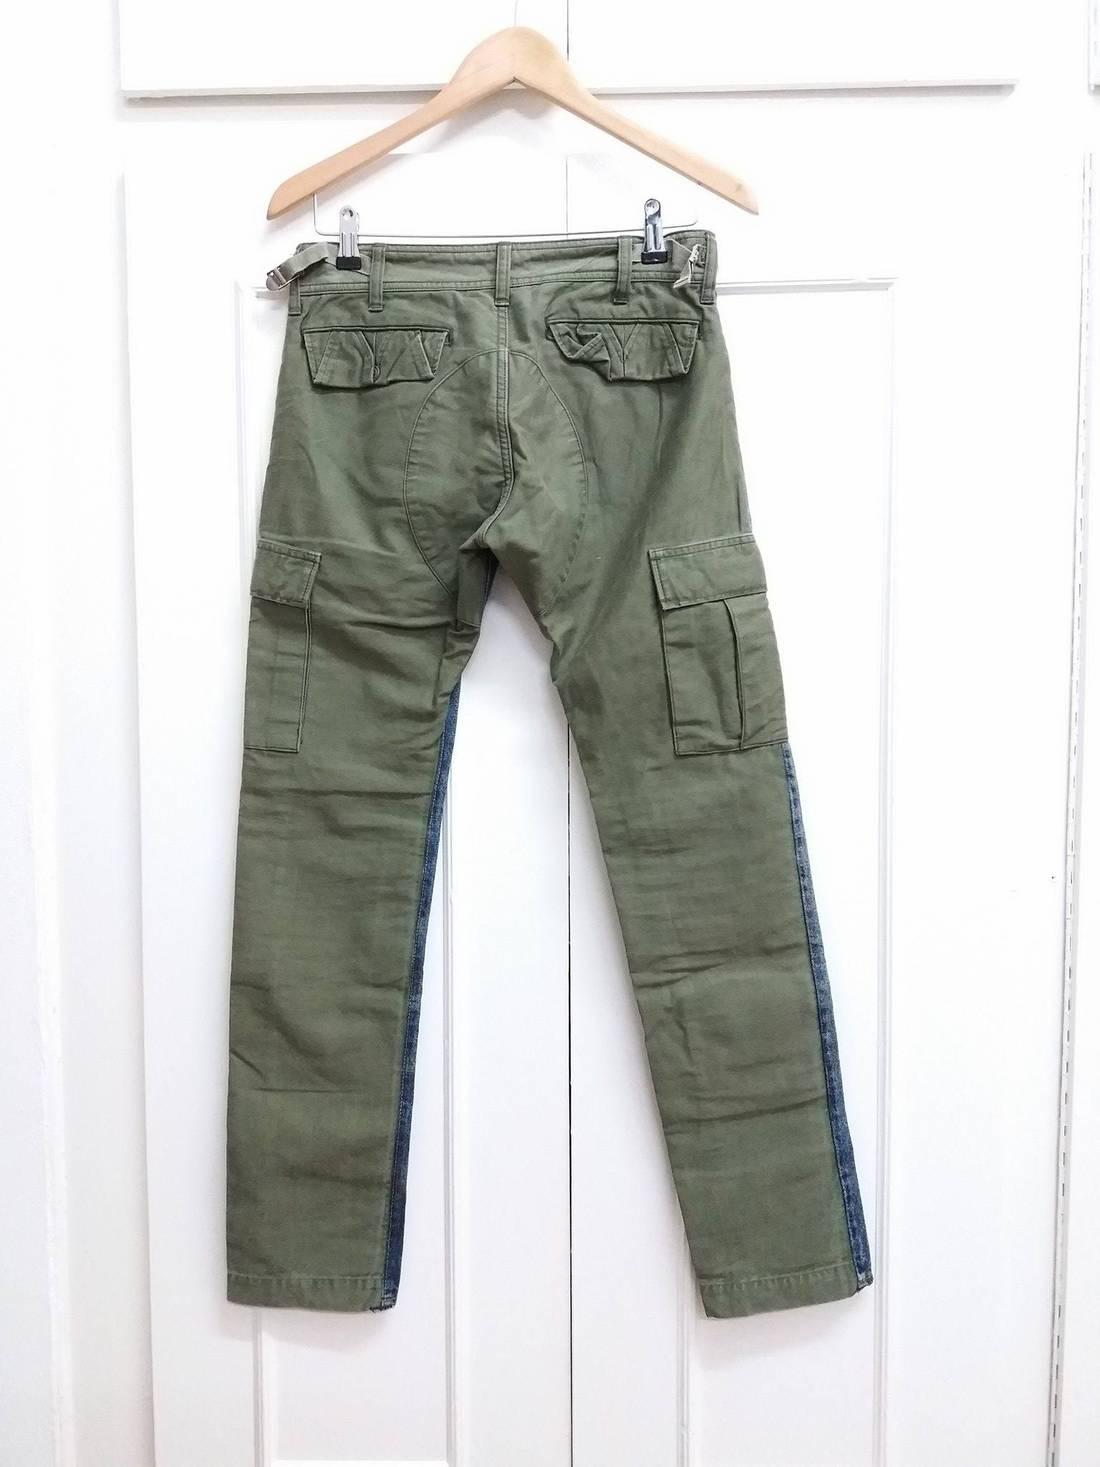 Undercover hybrid denim cargo pants size 1 size 29 denim for undercover hybrid denim cargo pants size 1 size us 29 2 malvernweather Image collections